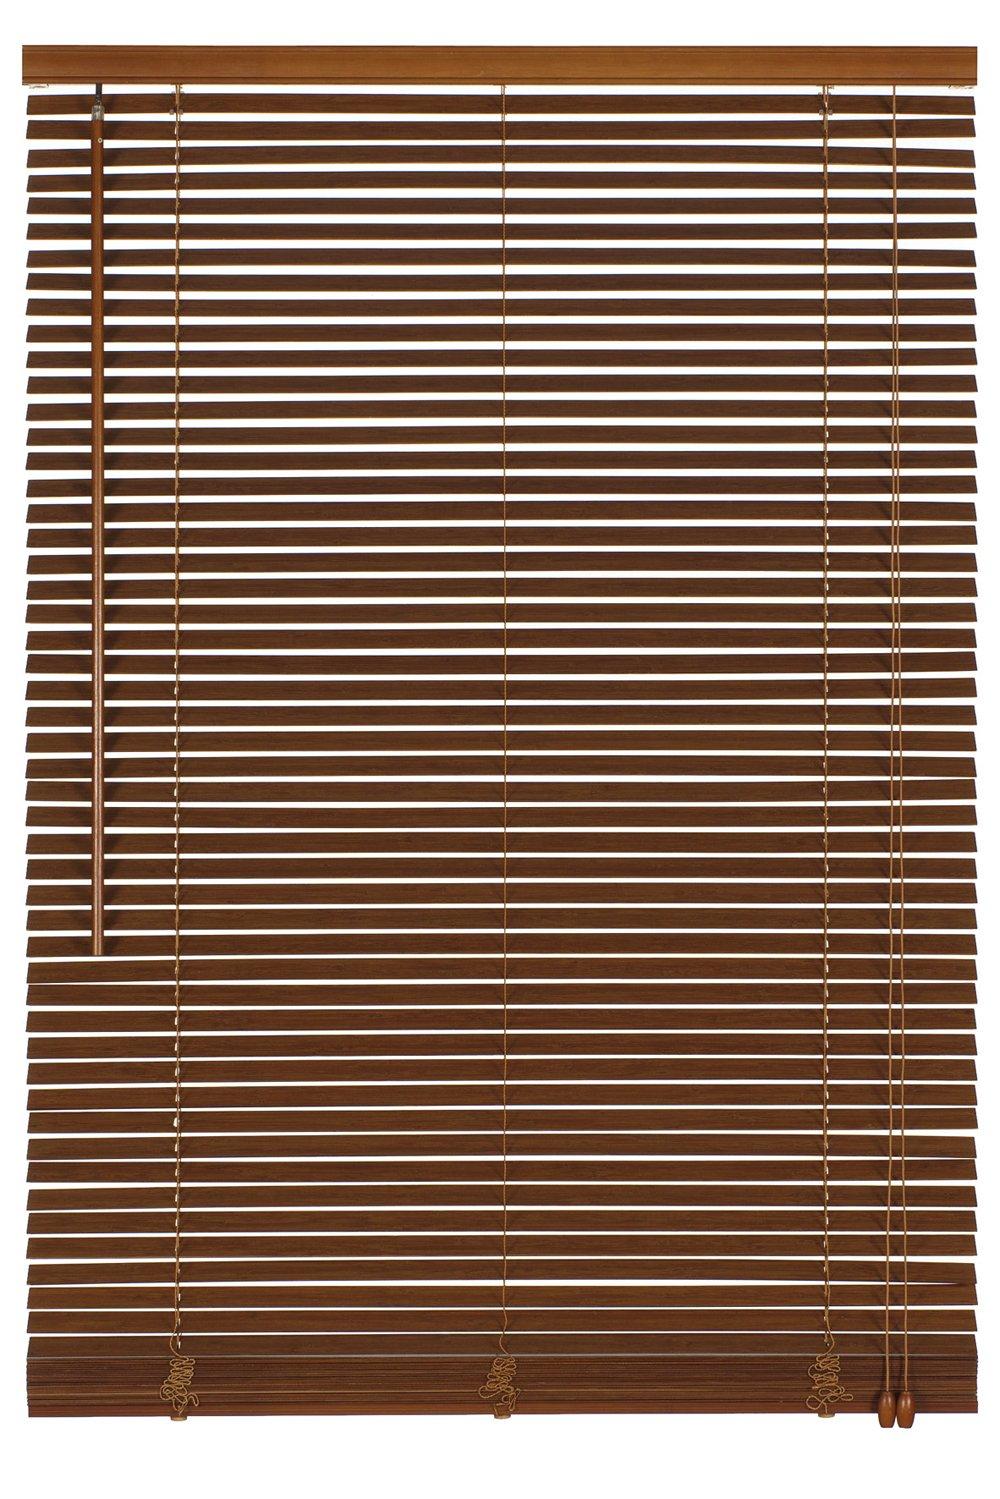 Interessant Amazon.de: Gardinia 10007732 Holz-Jalousie 25 mm, 100 x 160 cm, eiche LK02